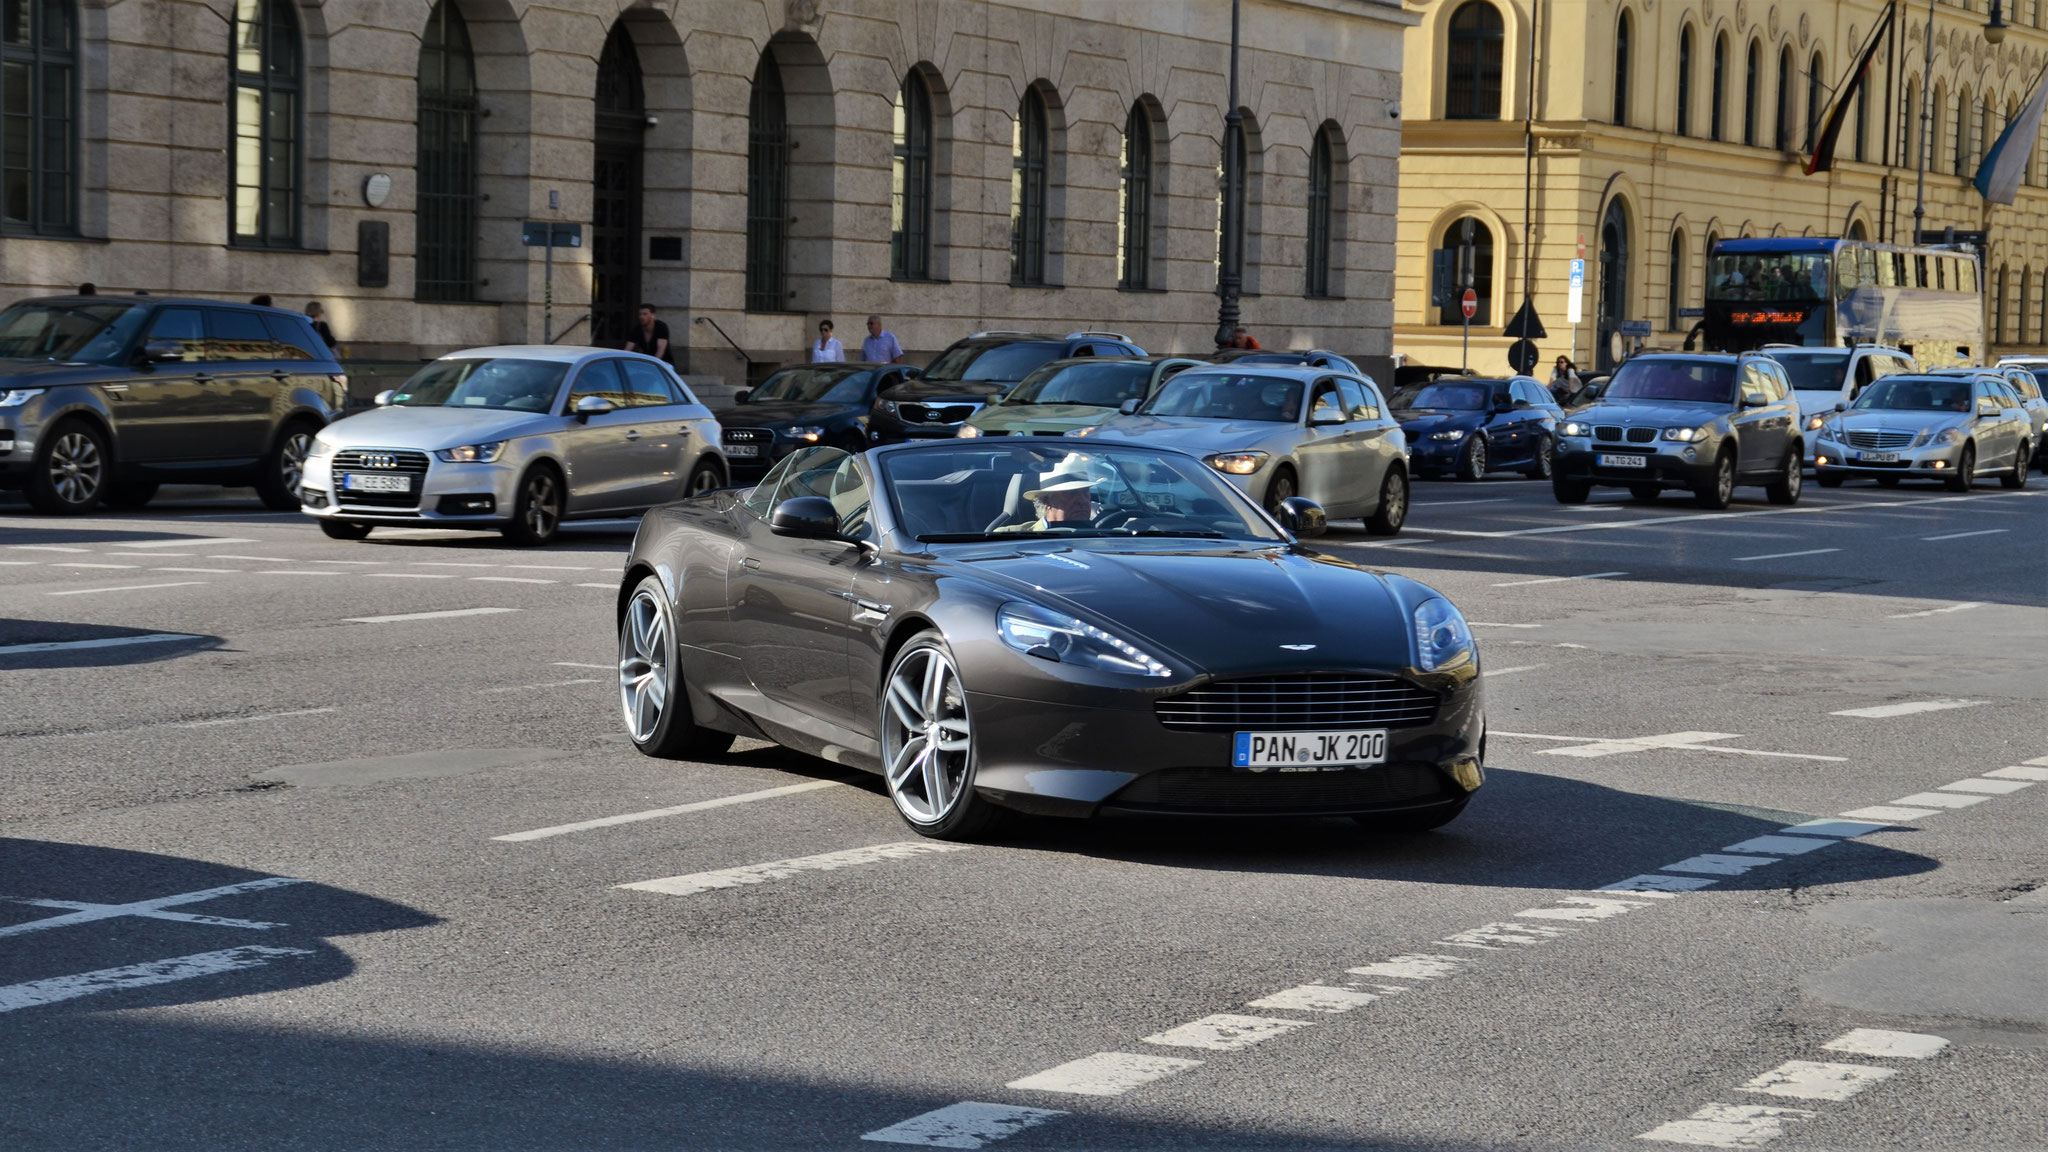 Aston Martin DB9 GT Volante - PAN-JN-200